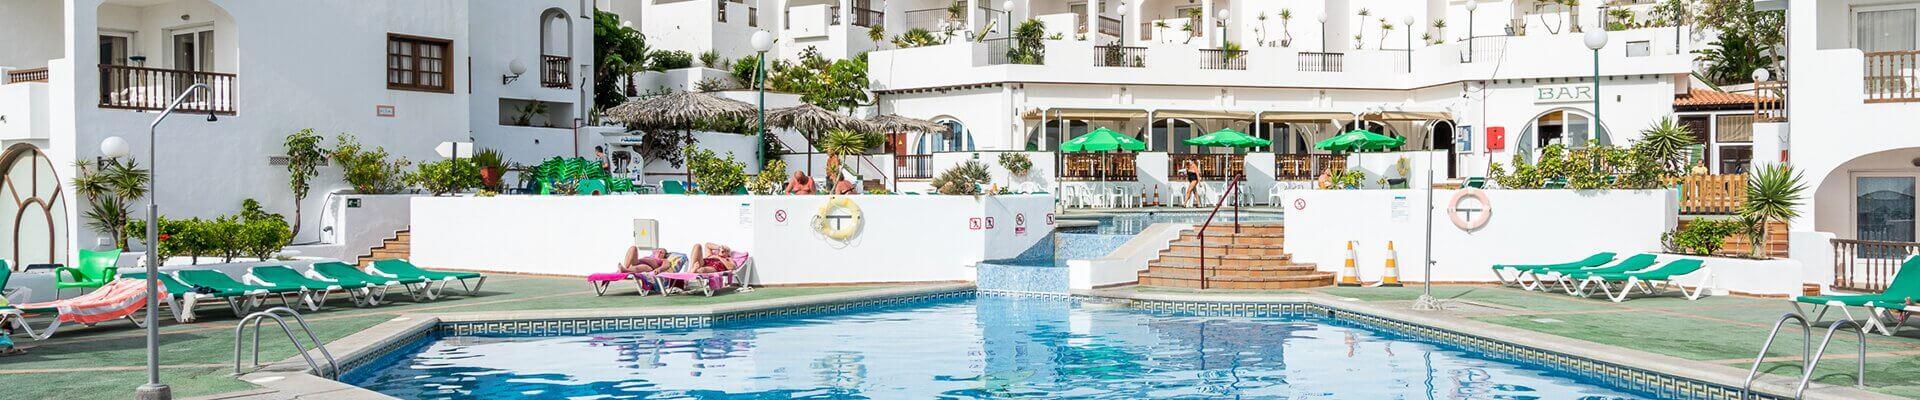 Official Web】Hotel BLUESEA Callao Garden - BLUESEA Hotels